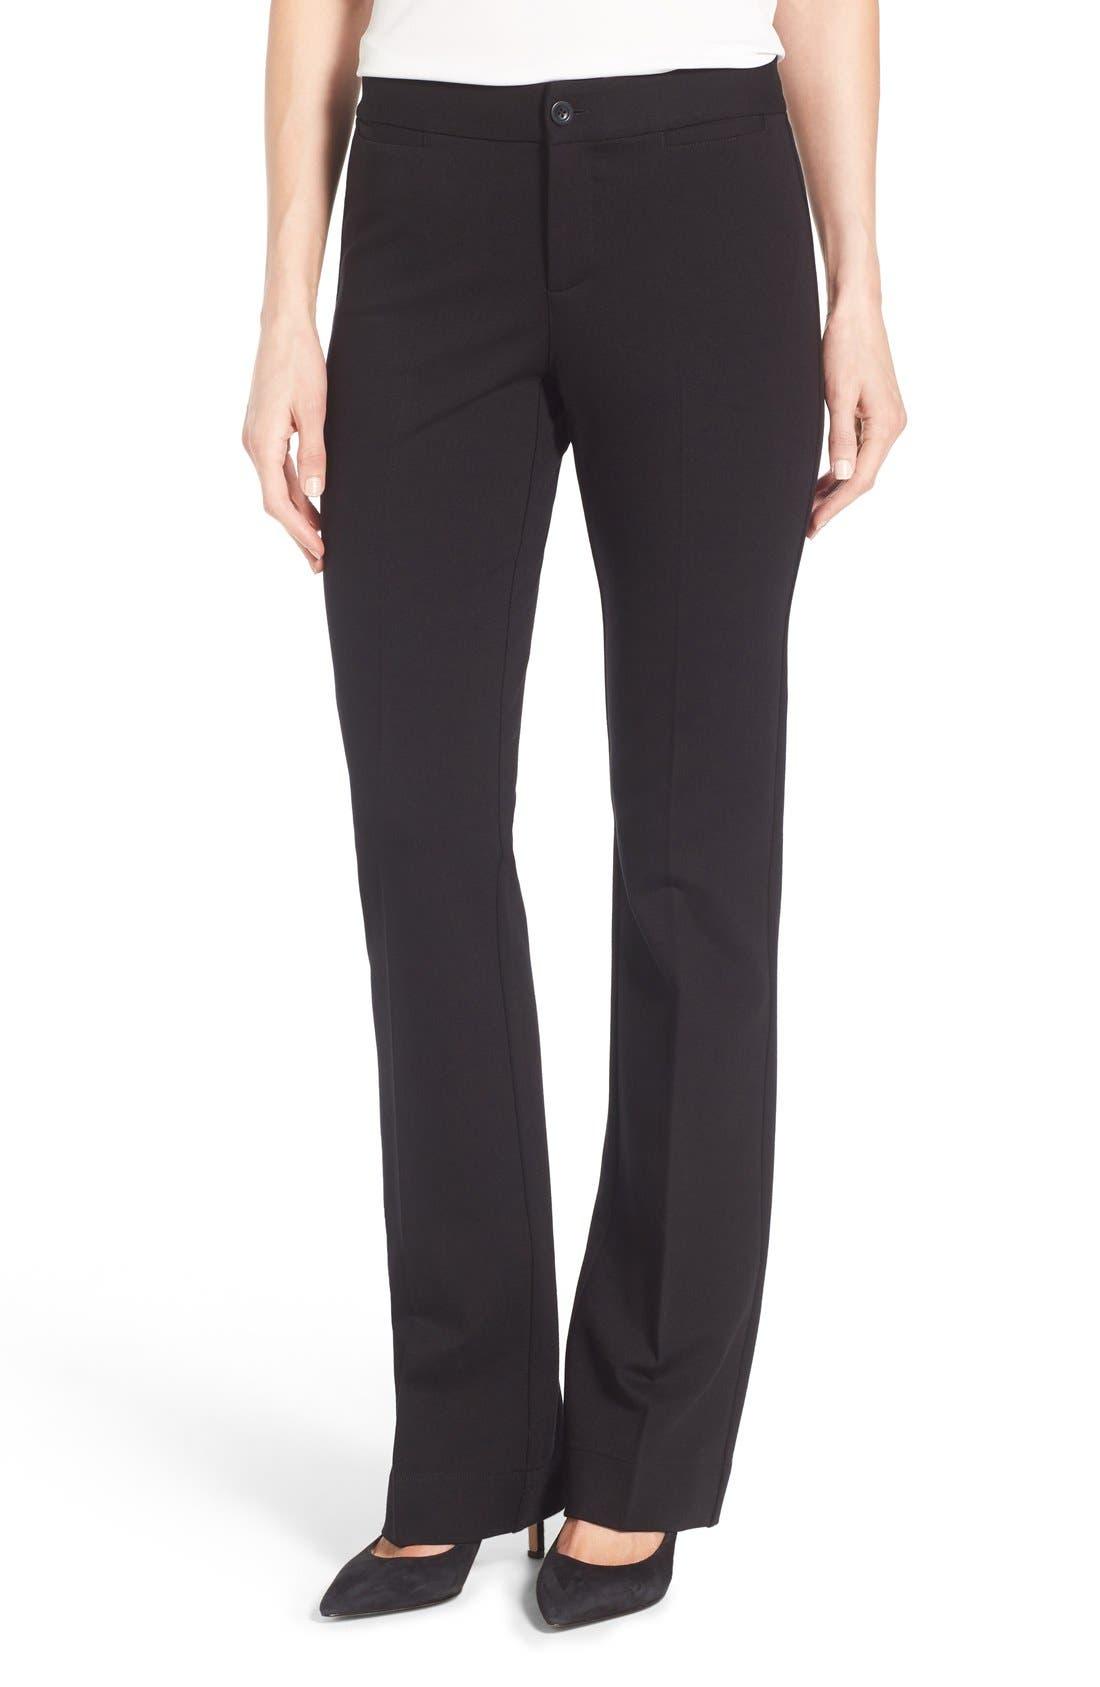 NYDJ Michelle Stretch Ponte Trousers (Regular & Petite)